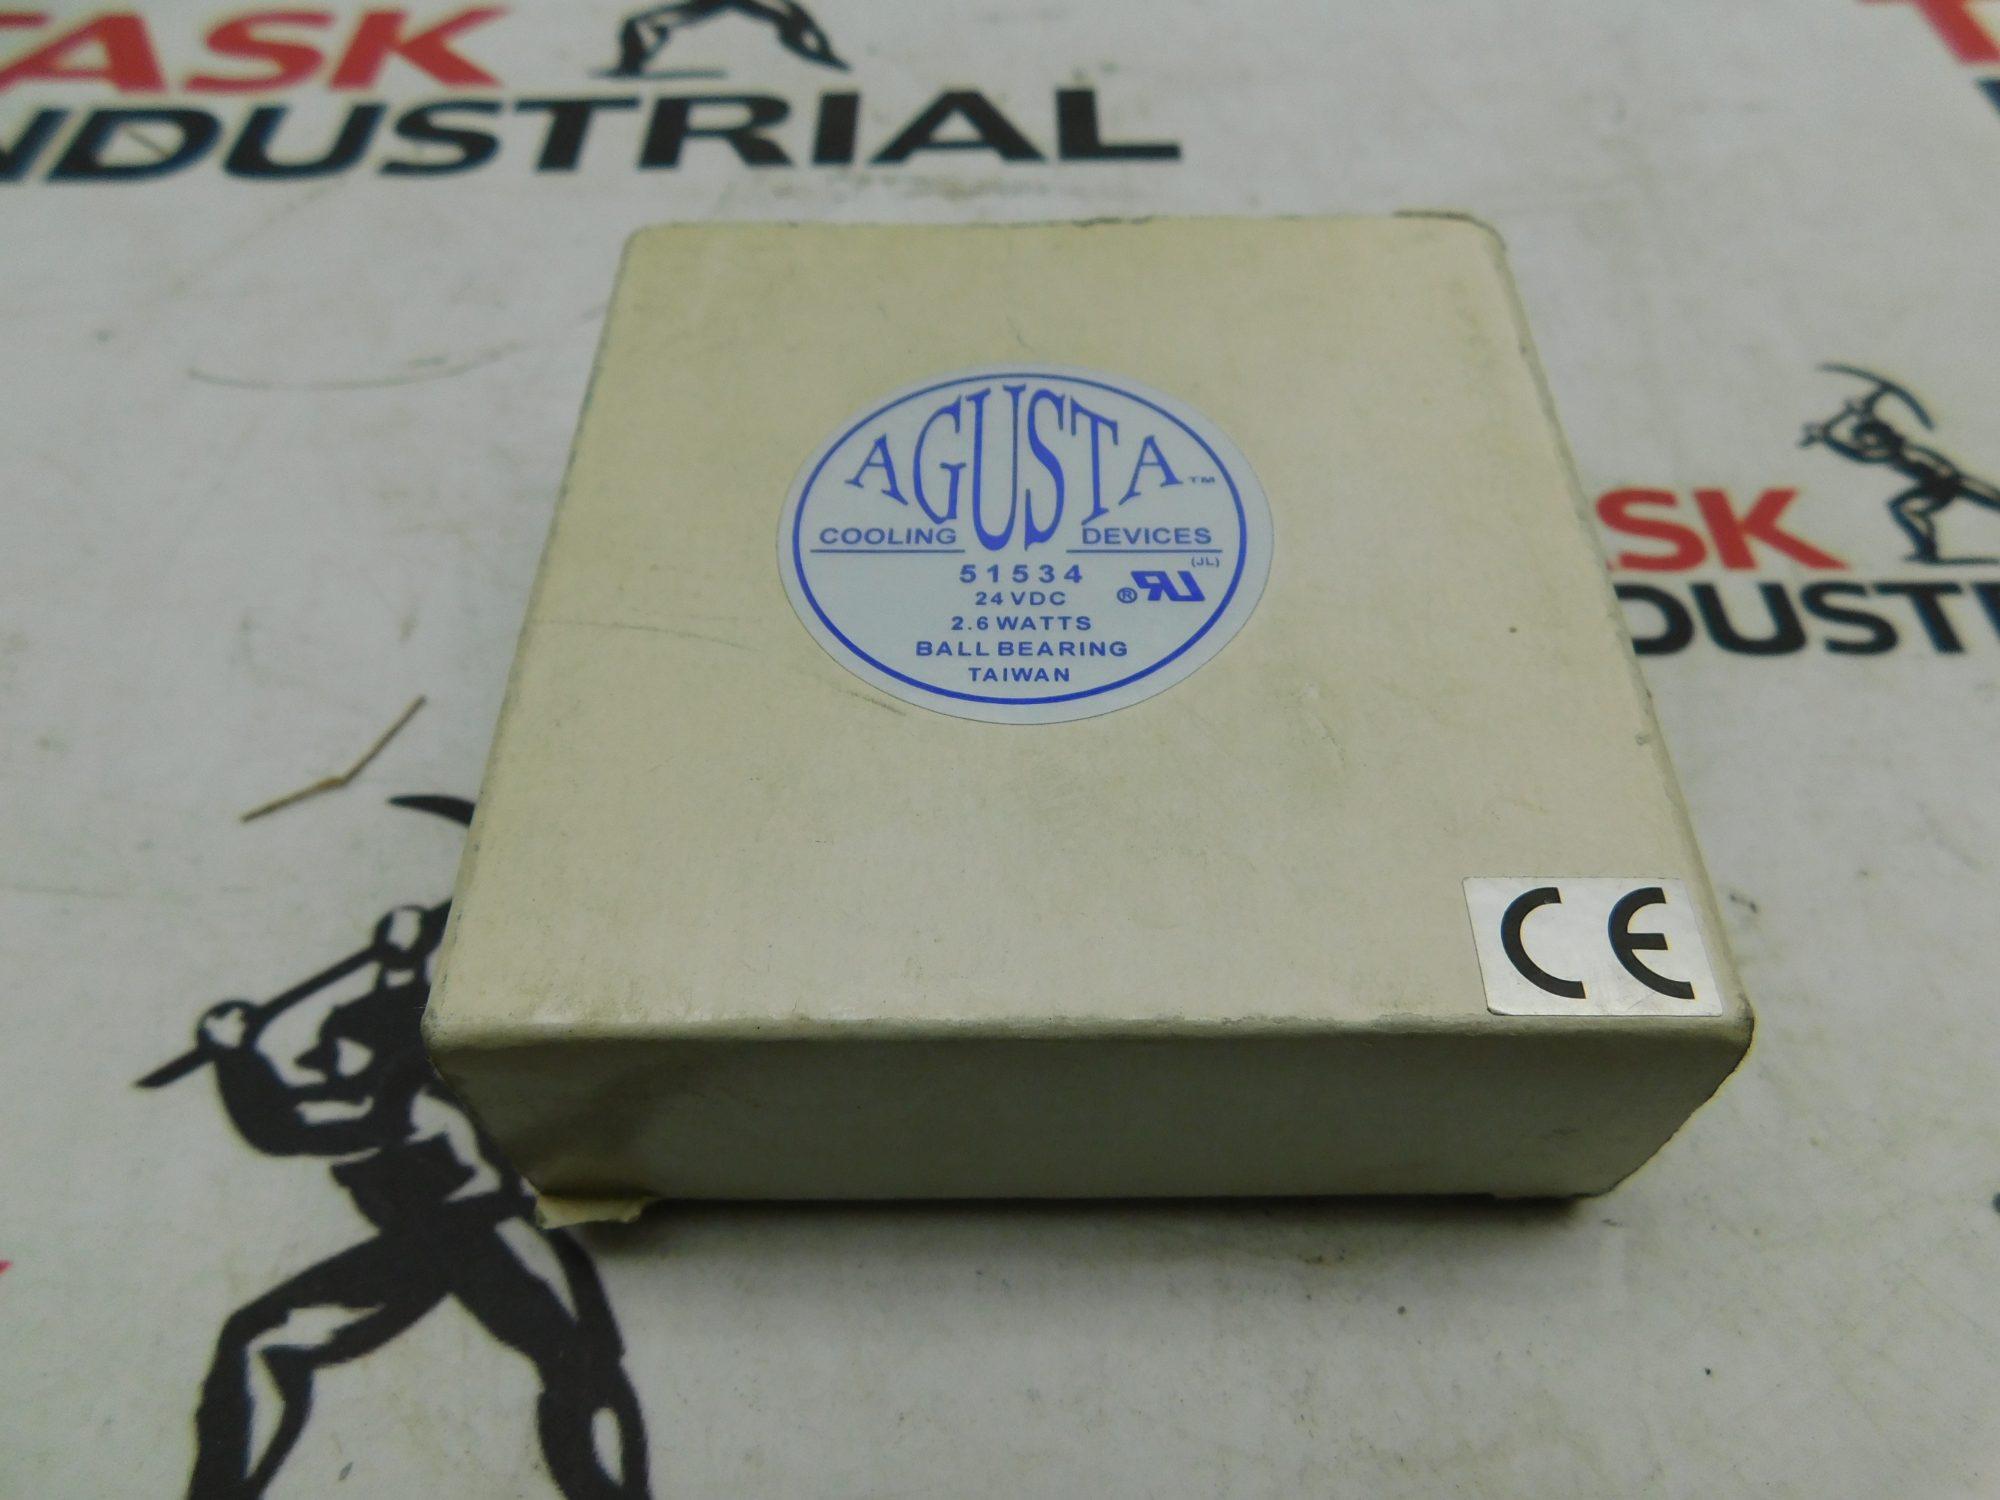 Agusta 51534 24VDC 2.6 Watts Ball Bearing